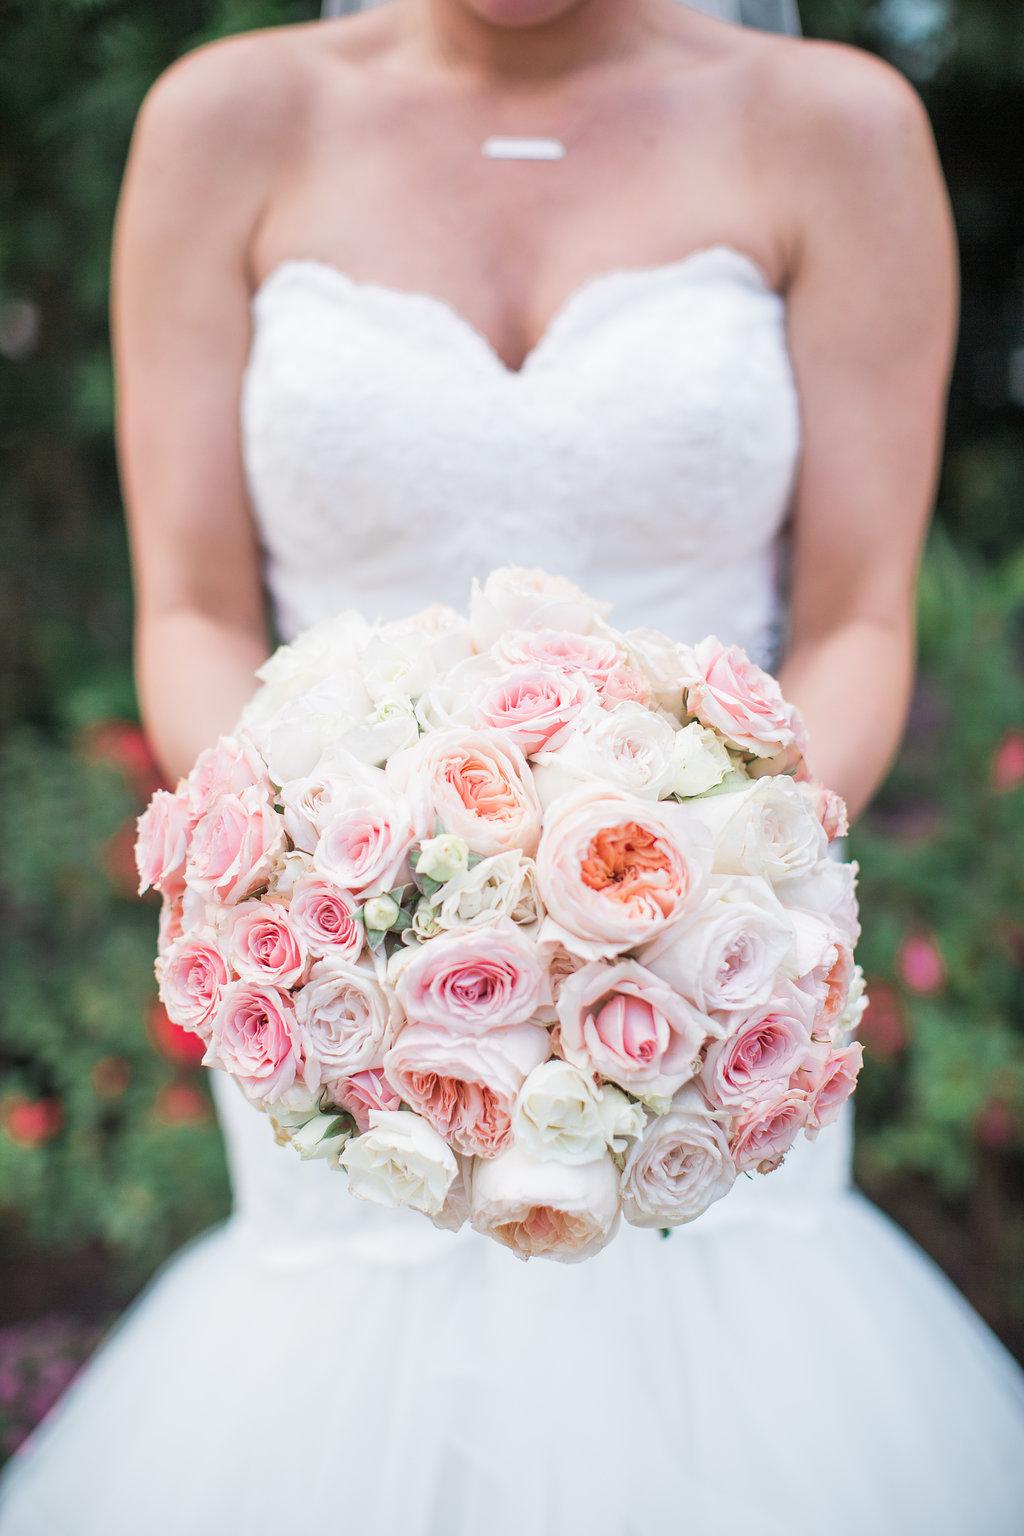 apt-b-photography-ivory-and-beau-bridal-boutique-savannah-florist-savannah-wedding-flowers-savannah-wedding-planner-tybee-island-wedding-chapel-wedding-rose-bouquet-blush-wedding-tybee-wedding-savannah-weddings-savannah-flowers-35.jpg